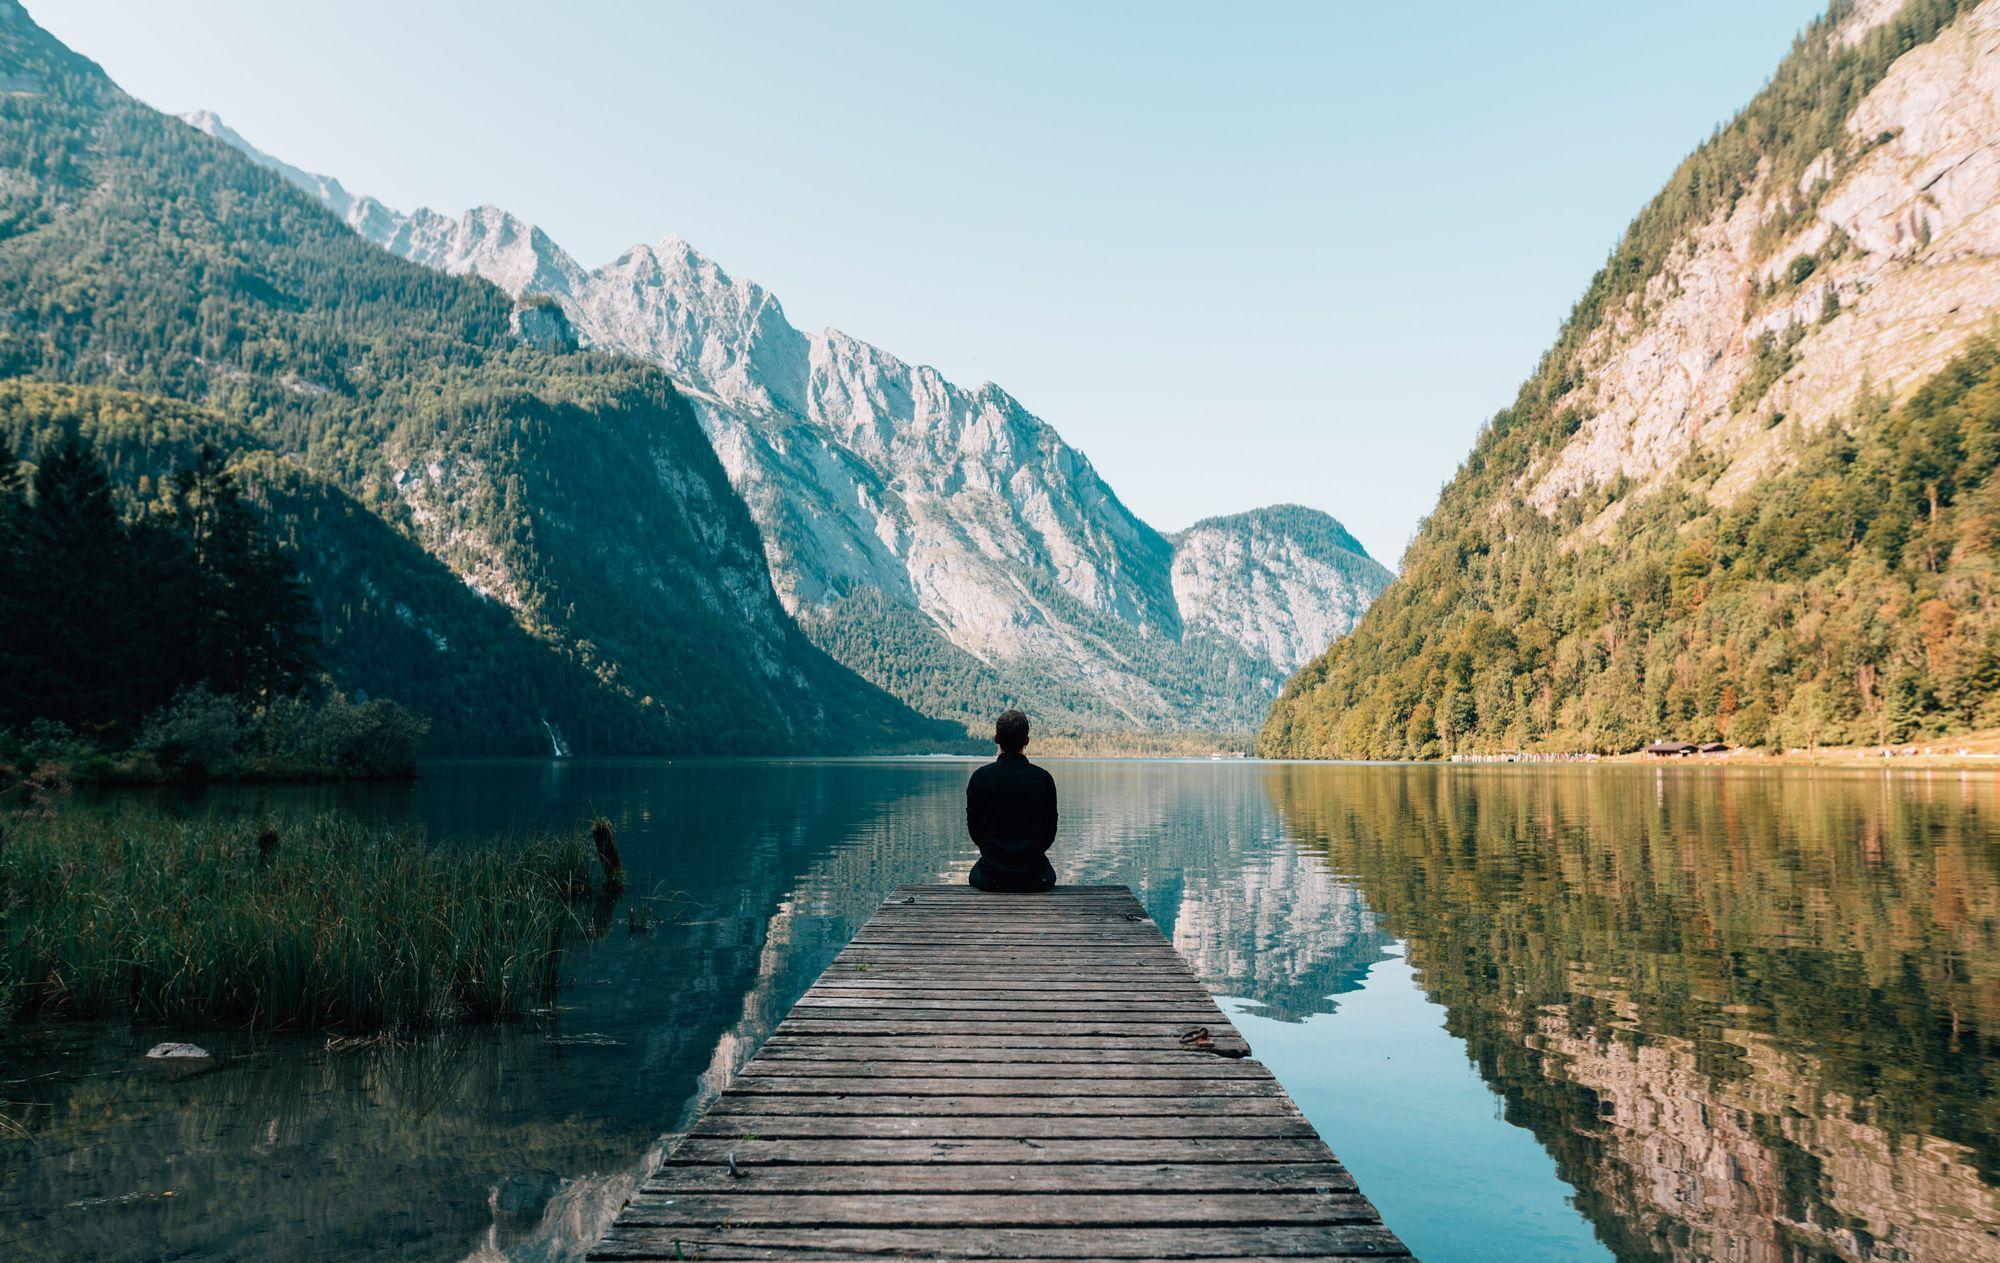 Man on wharf at serene lake eliminating stress